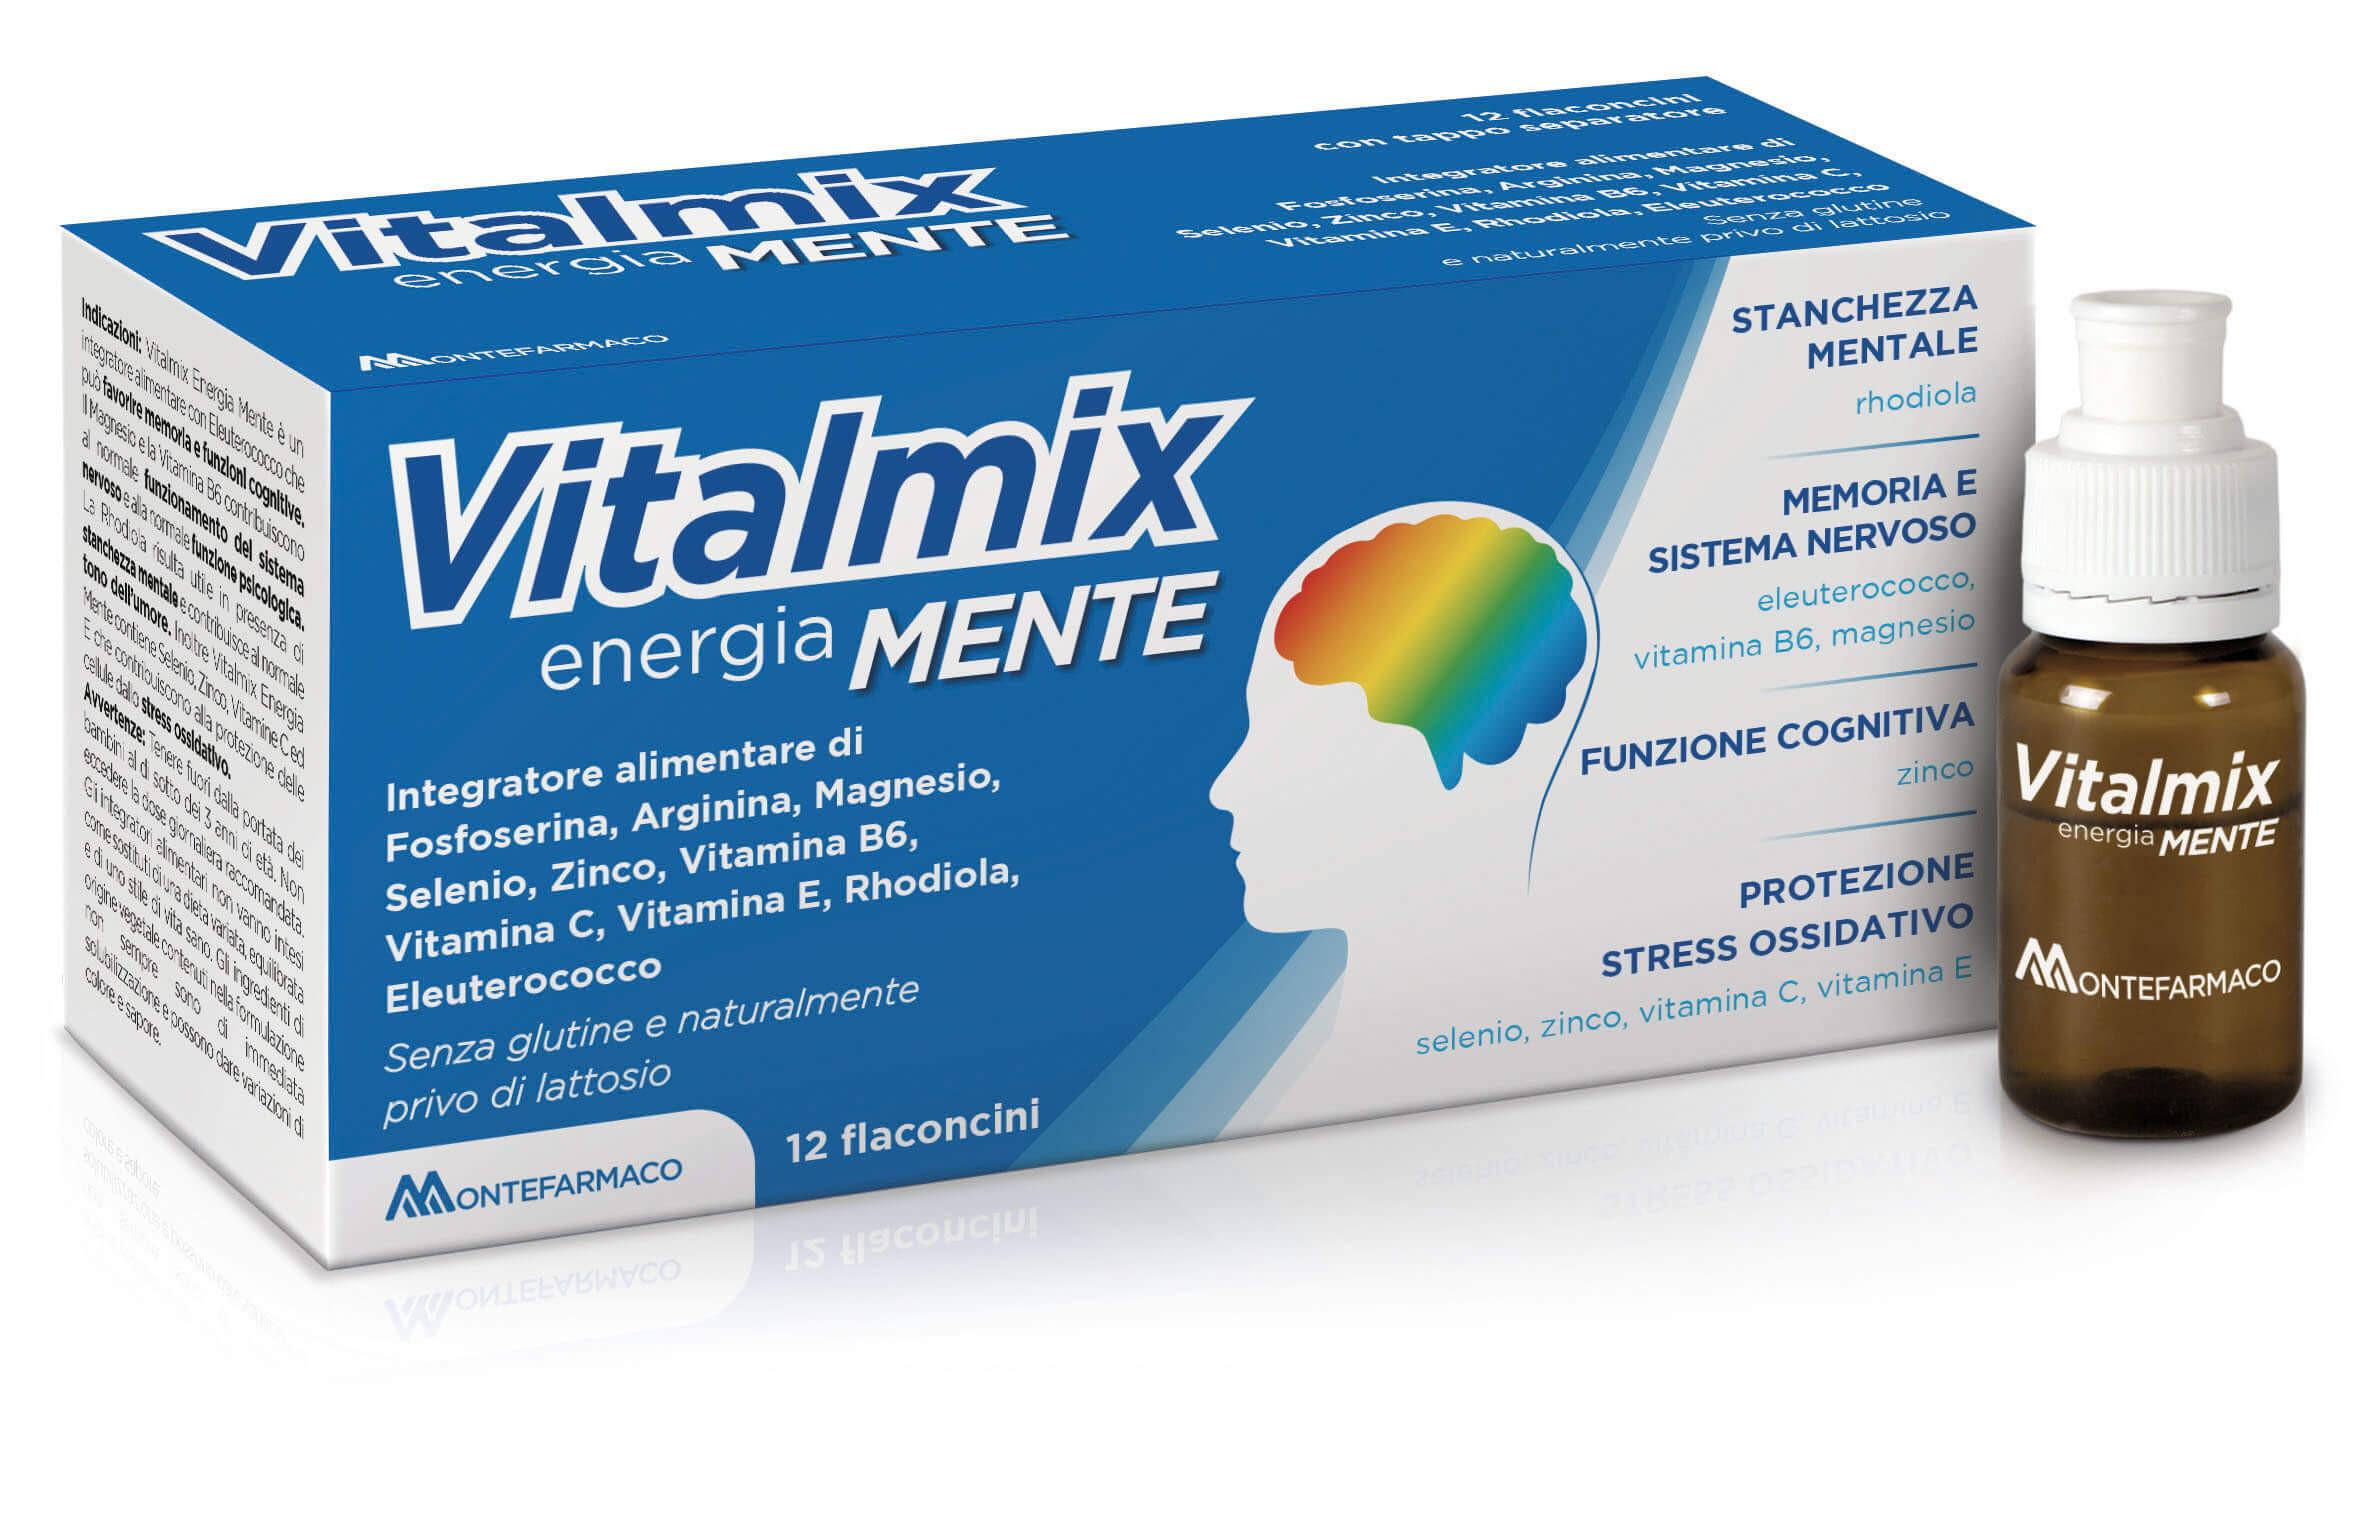 Vitalmix Energia Mente 12 flaconcini